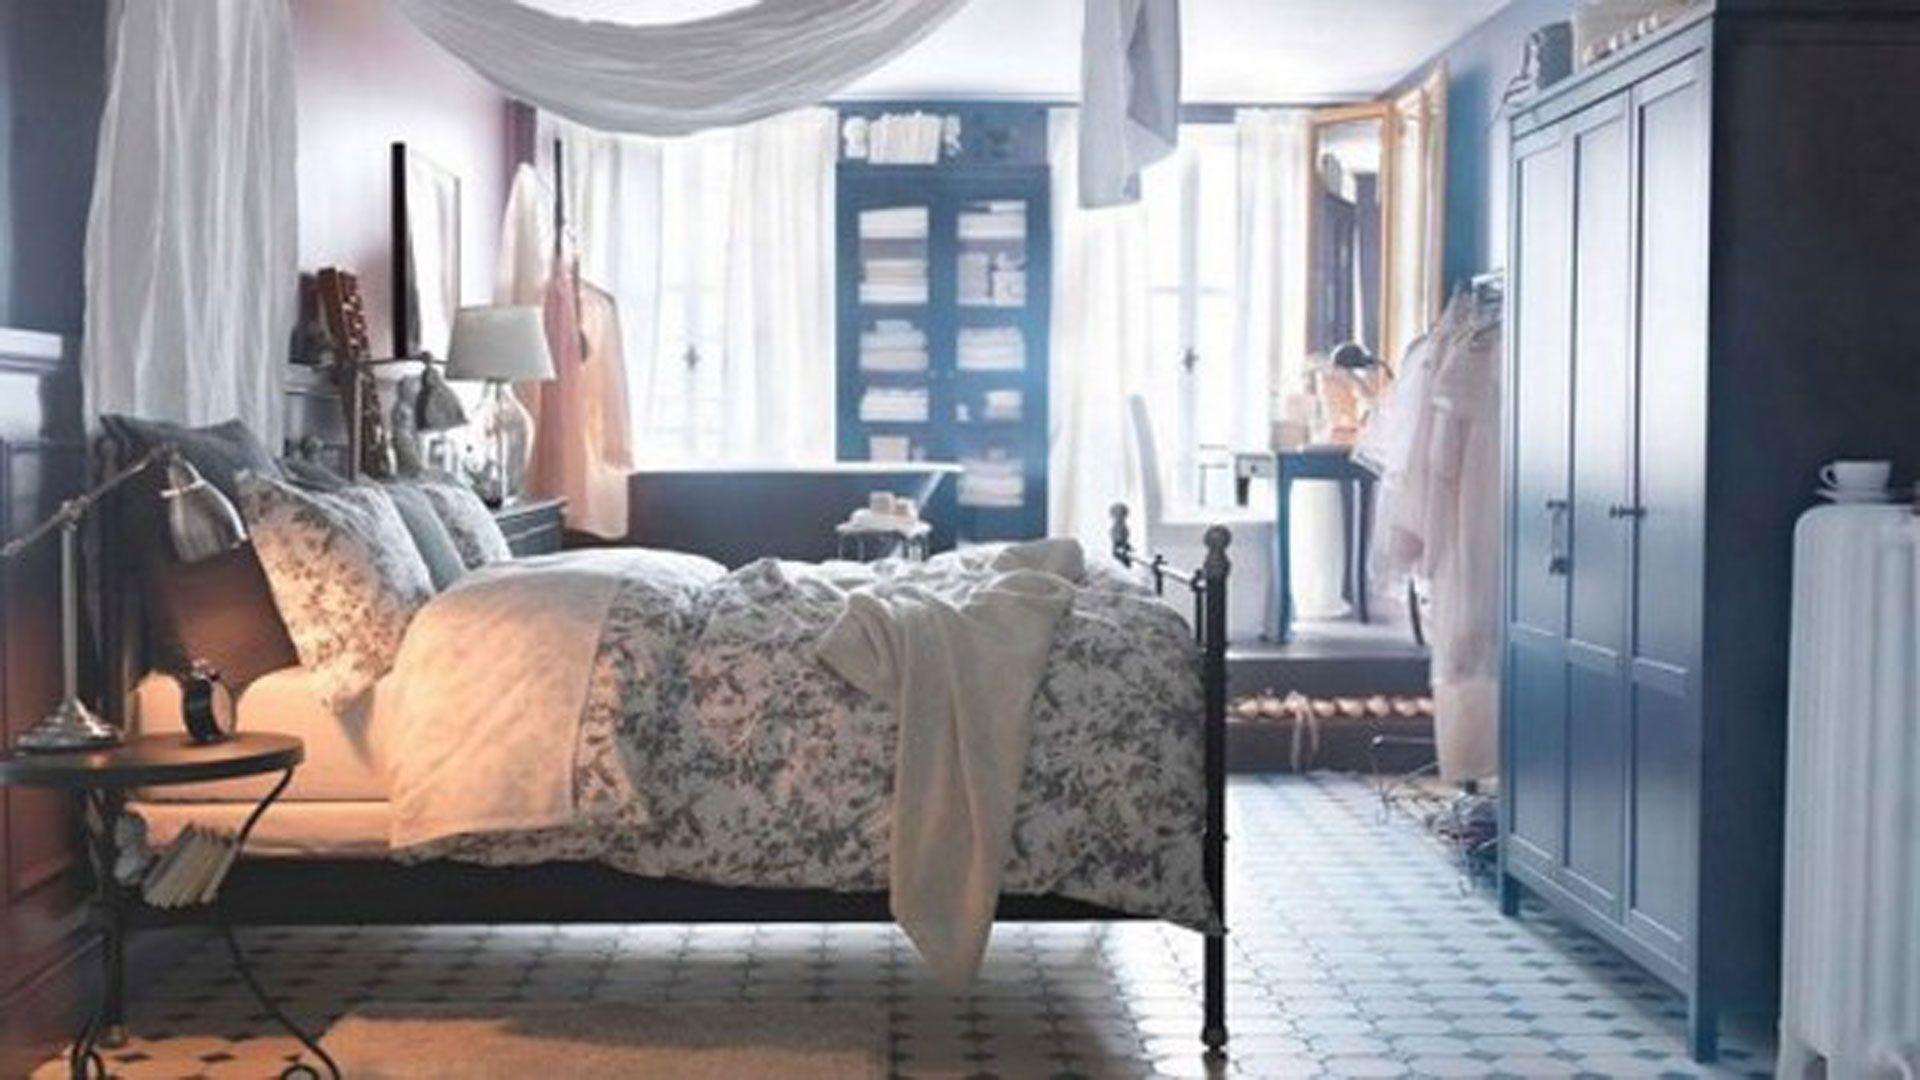 Ikea Design Bedroom Magnificent Design Ideas Ikea Bedroom Design In Tritmonk Pictures Gallery Of Decorating Design